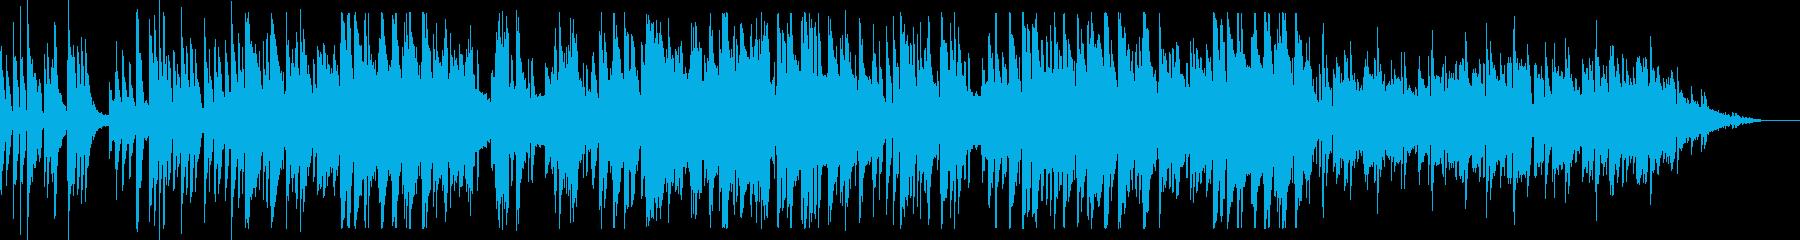 Jazz Soul's reproduced waveform